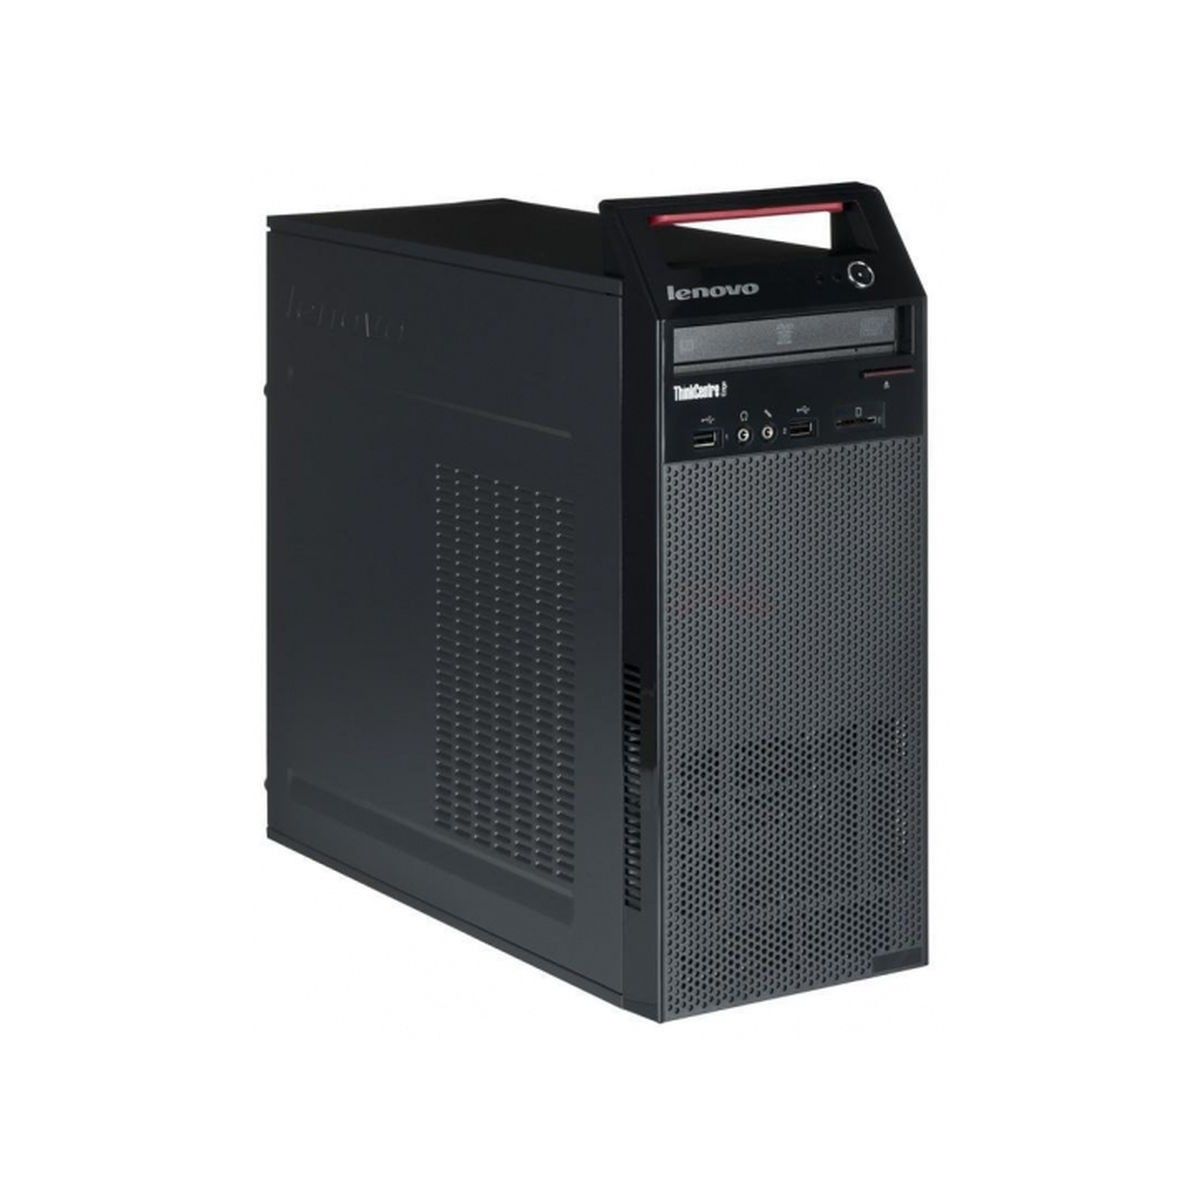 LENOVO EDGE 72 MT i3-3240 4GB 500GB SATA WIN10